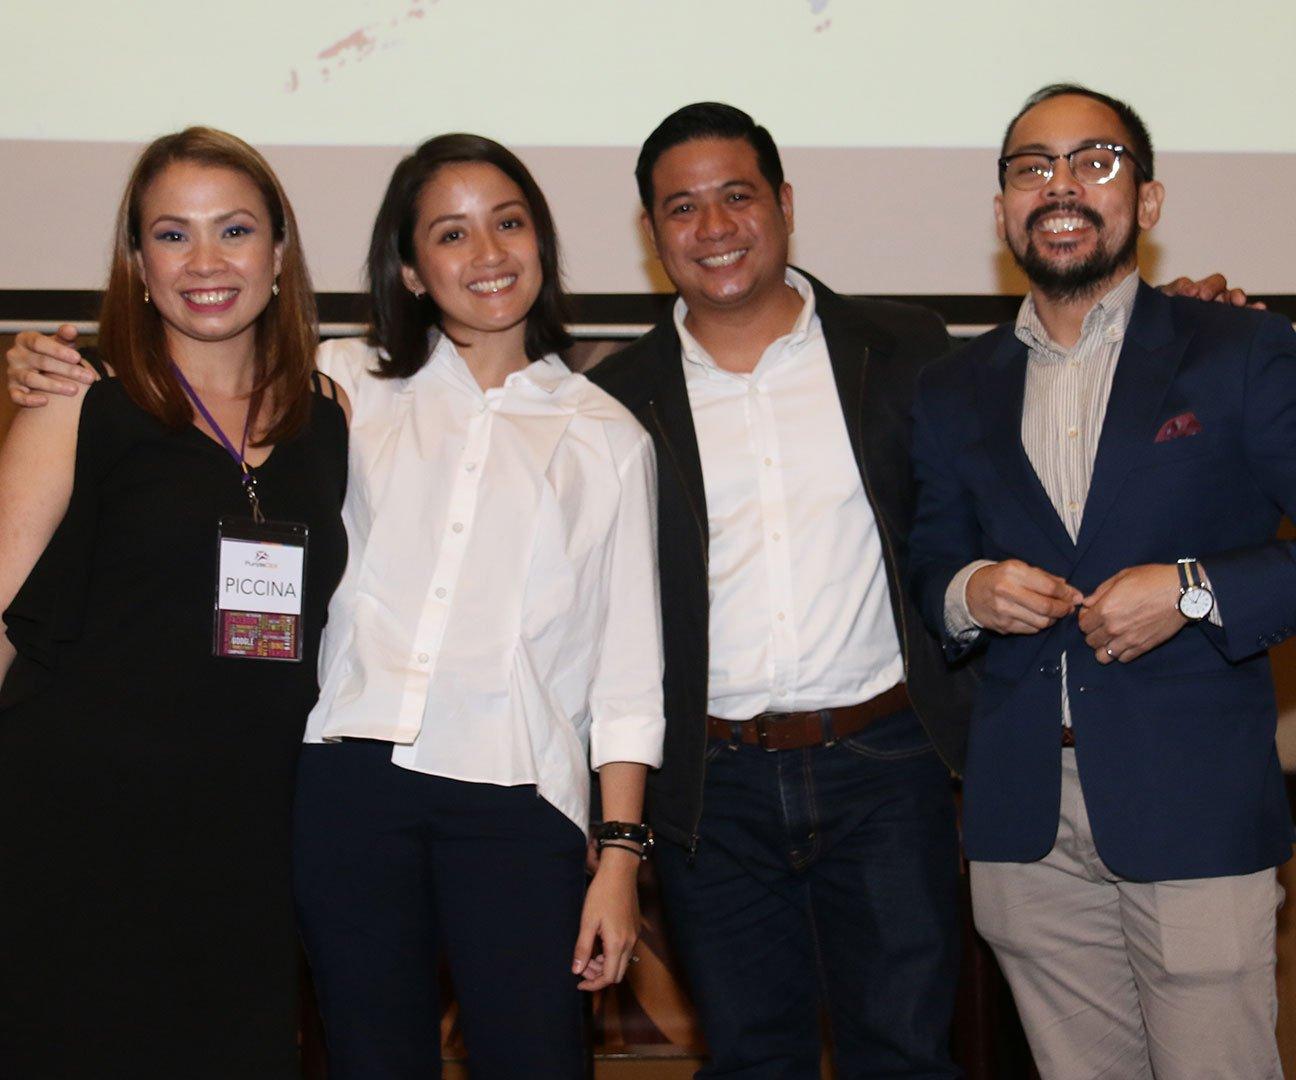 L-R: Piccina Alvarez (PurpleClick), Sheena Siao (Facebook), Fro Oliva (PLDT), Jonathan Joson (Google)